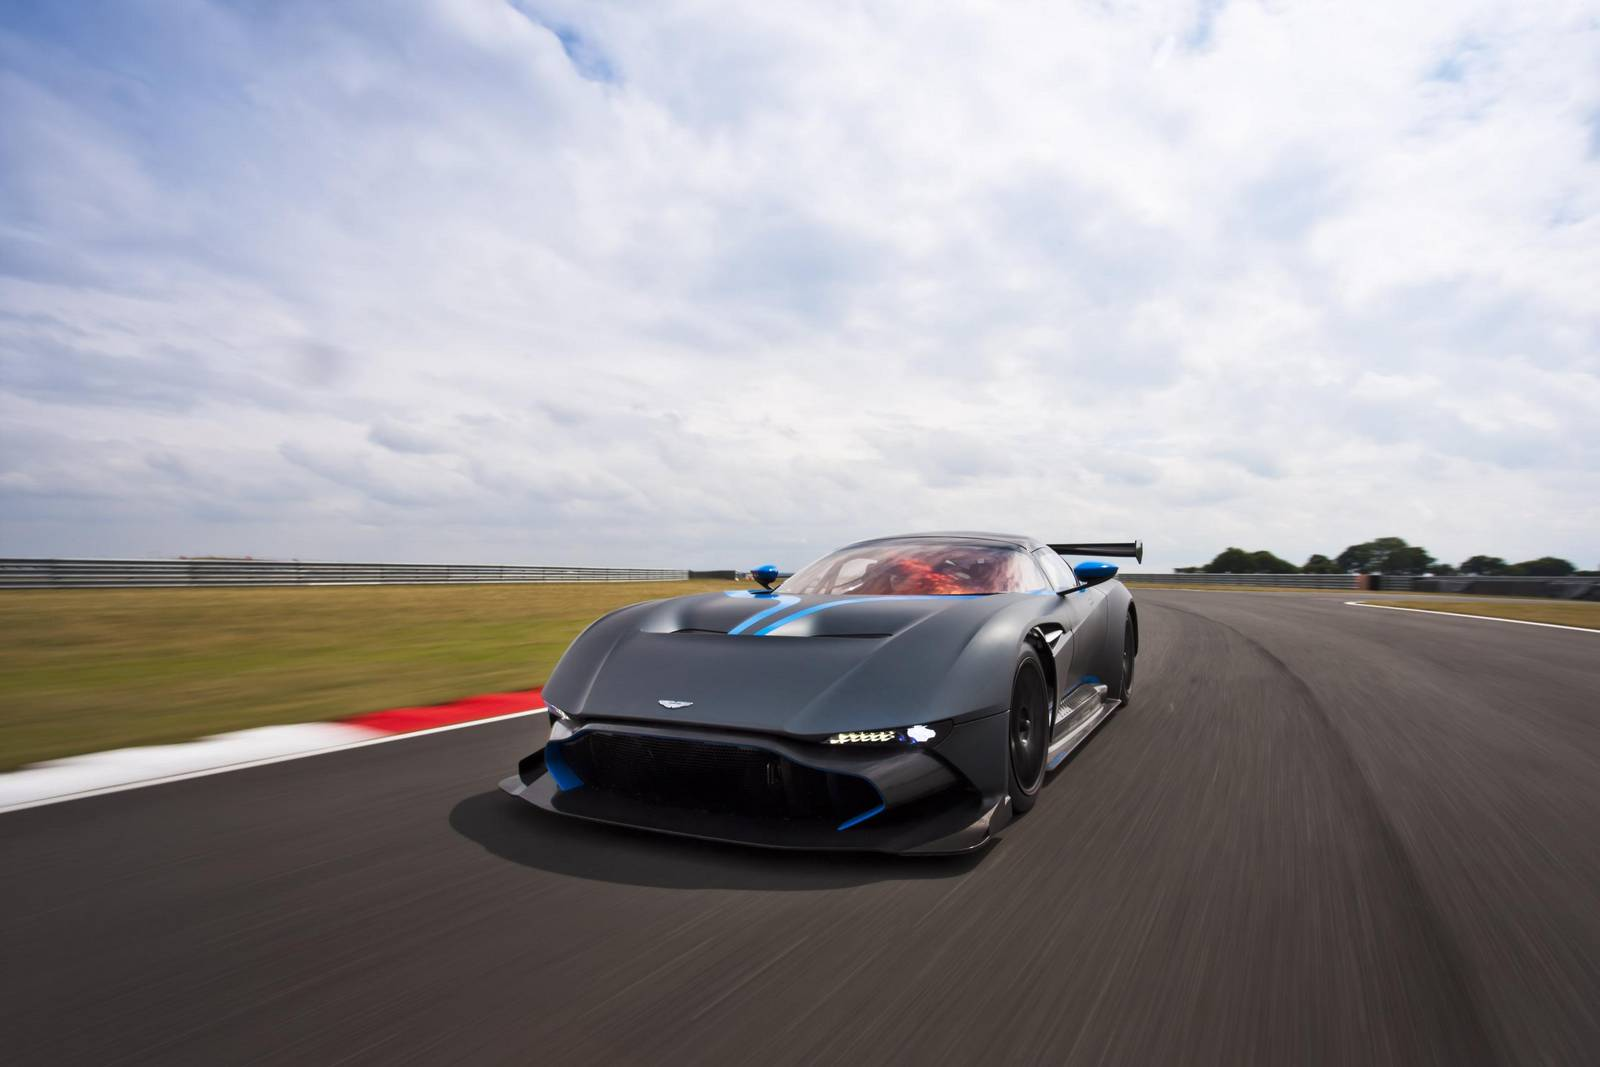 Aston Martin Vulcan Heading To Pebble Beach 2015 Gtspirit